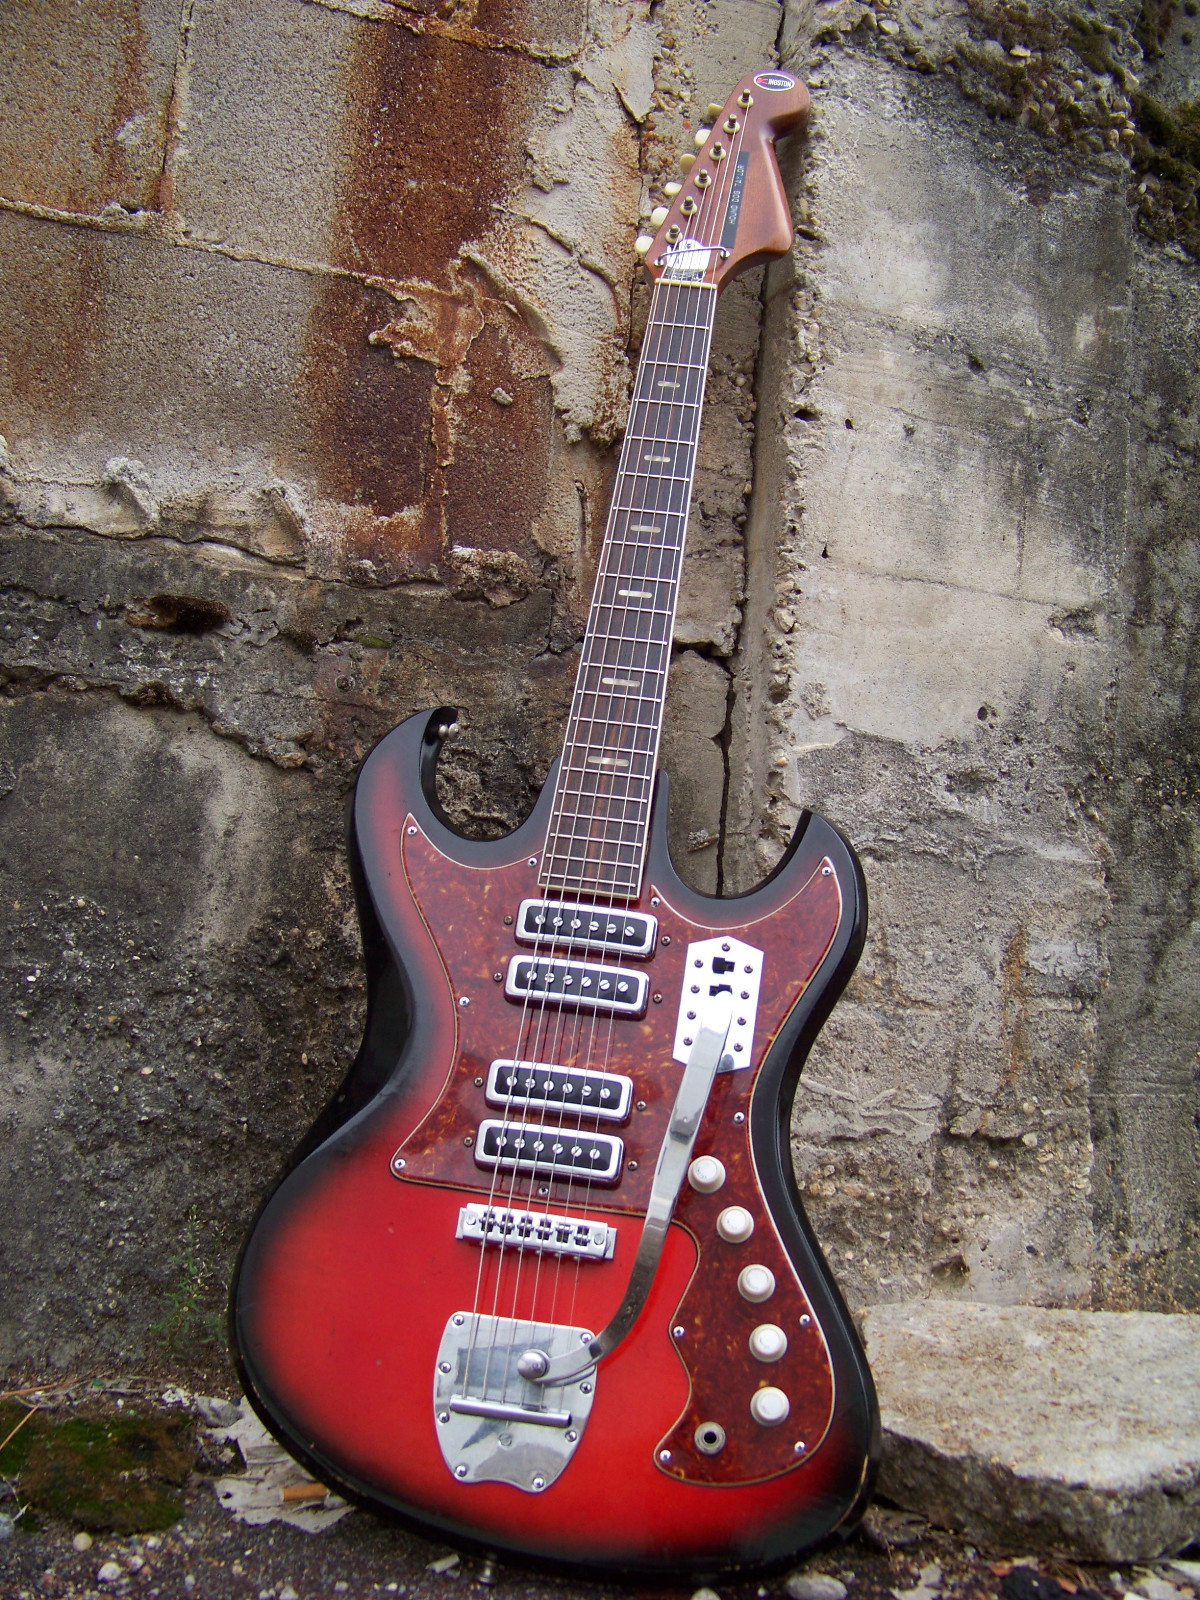 medium resolution of the genuine hound dog taylor kawai teisco electric guitar